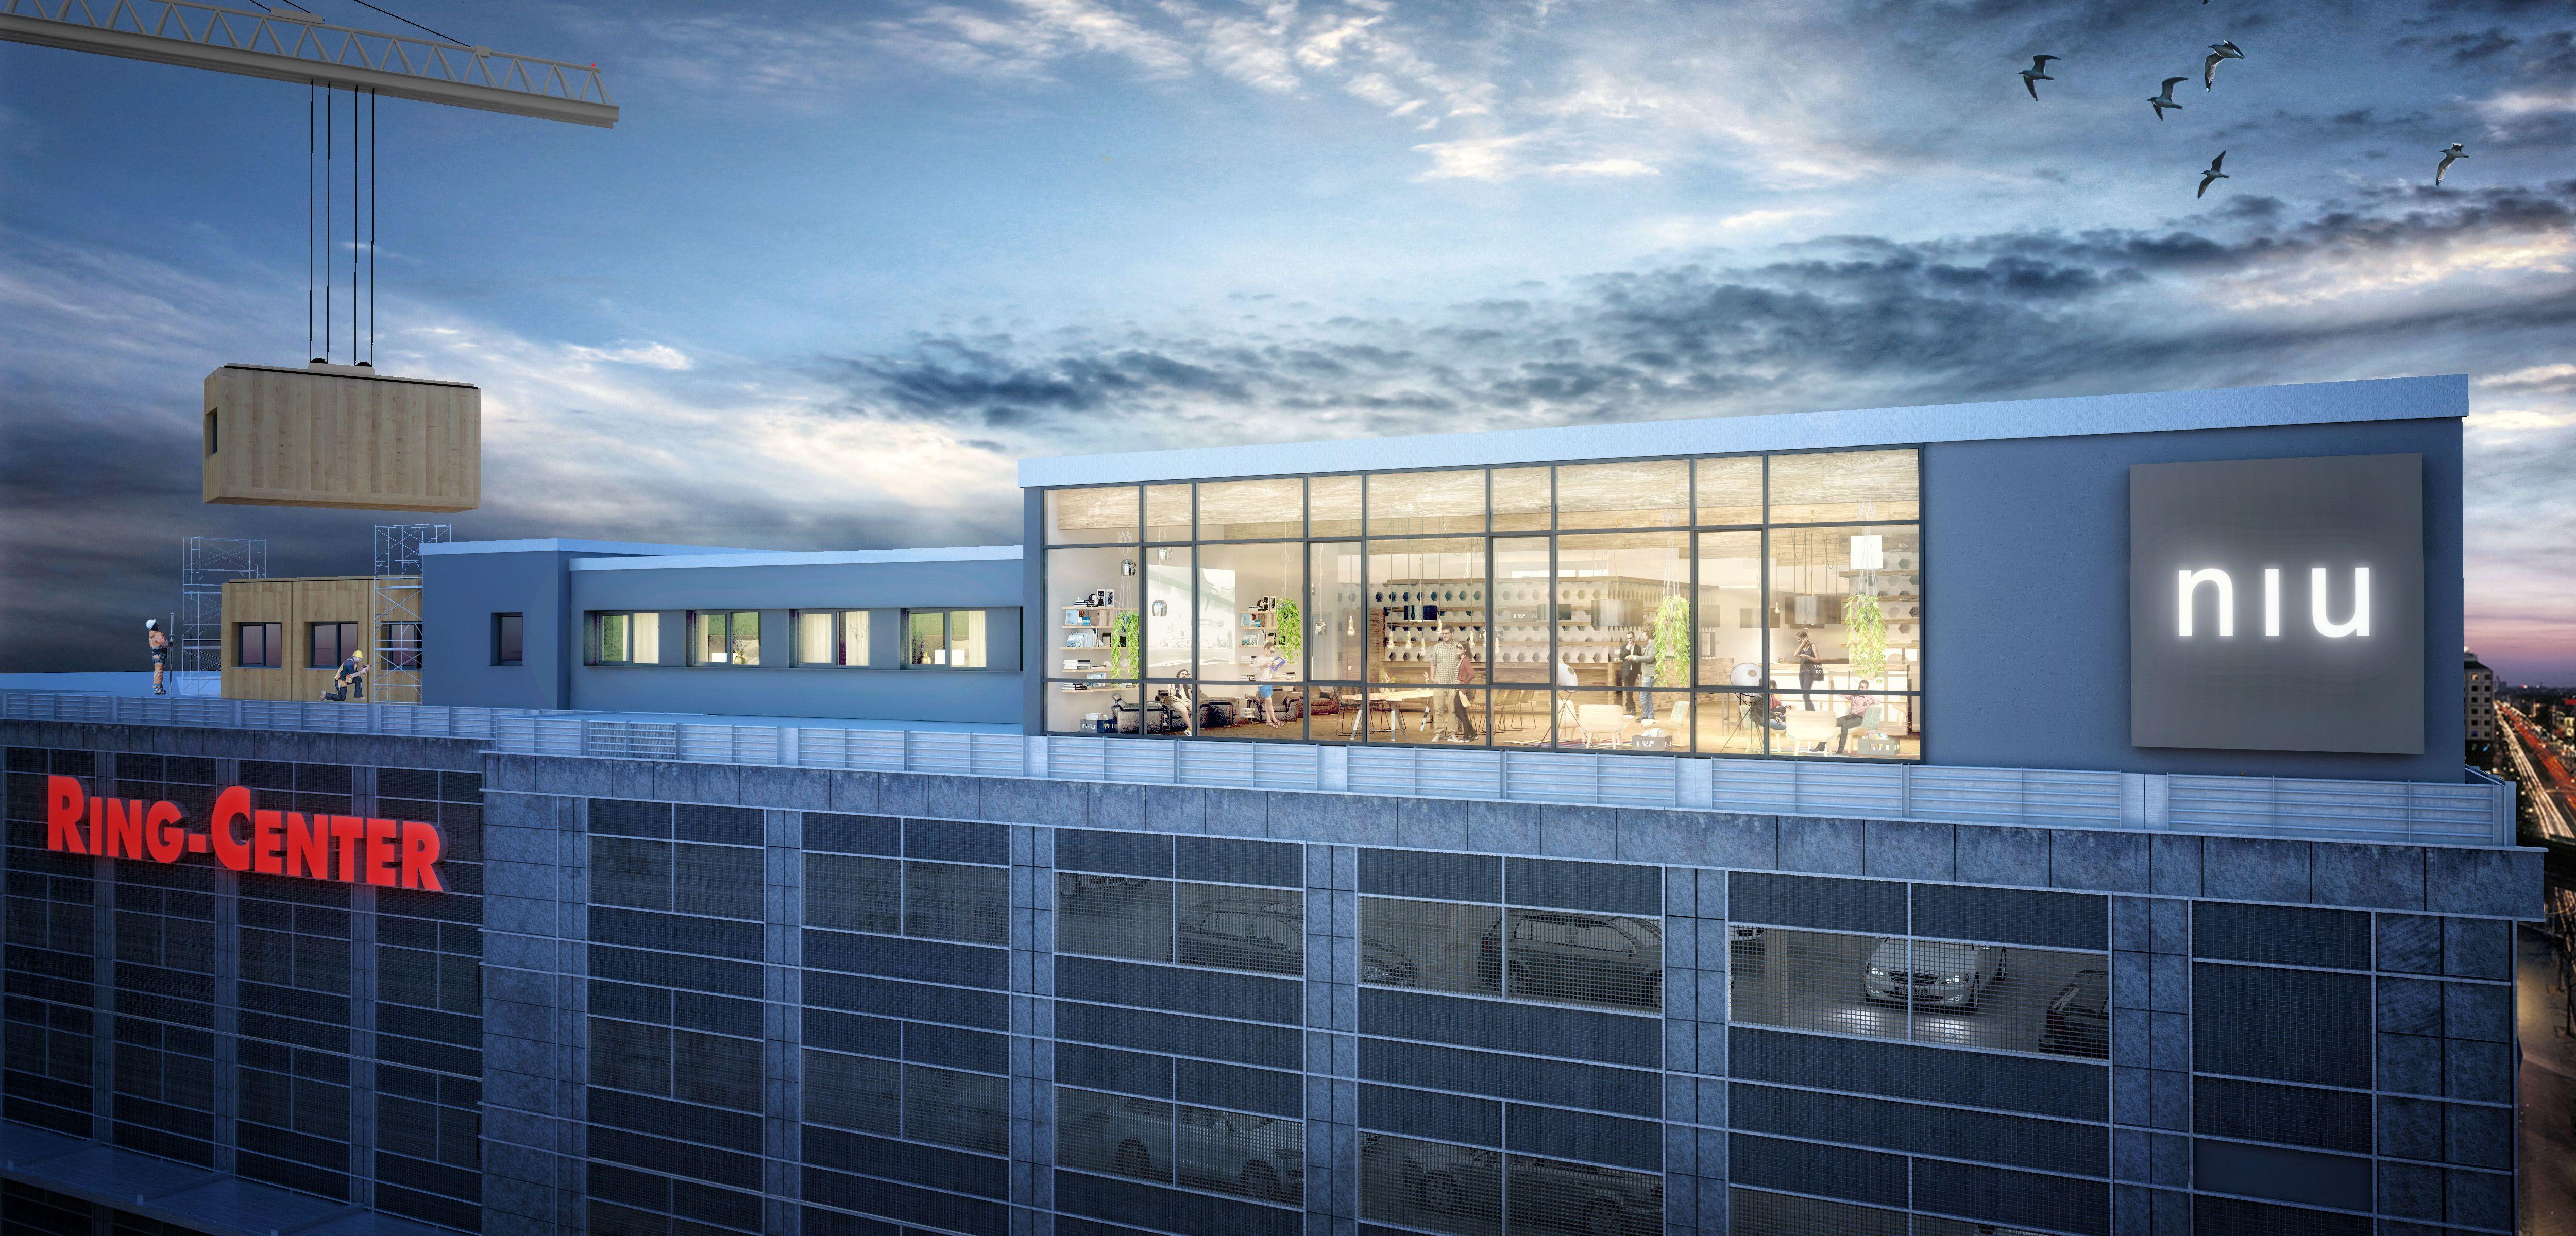 Visualisierung Berlin berlin hotel rooftop woodstrucutre modular render